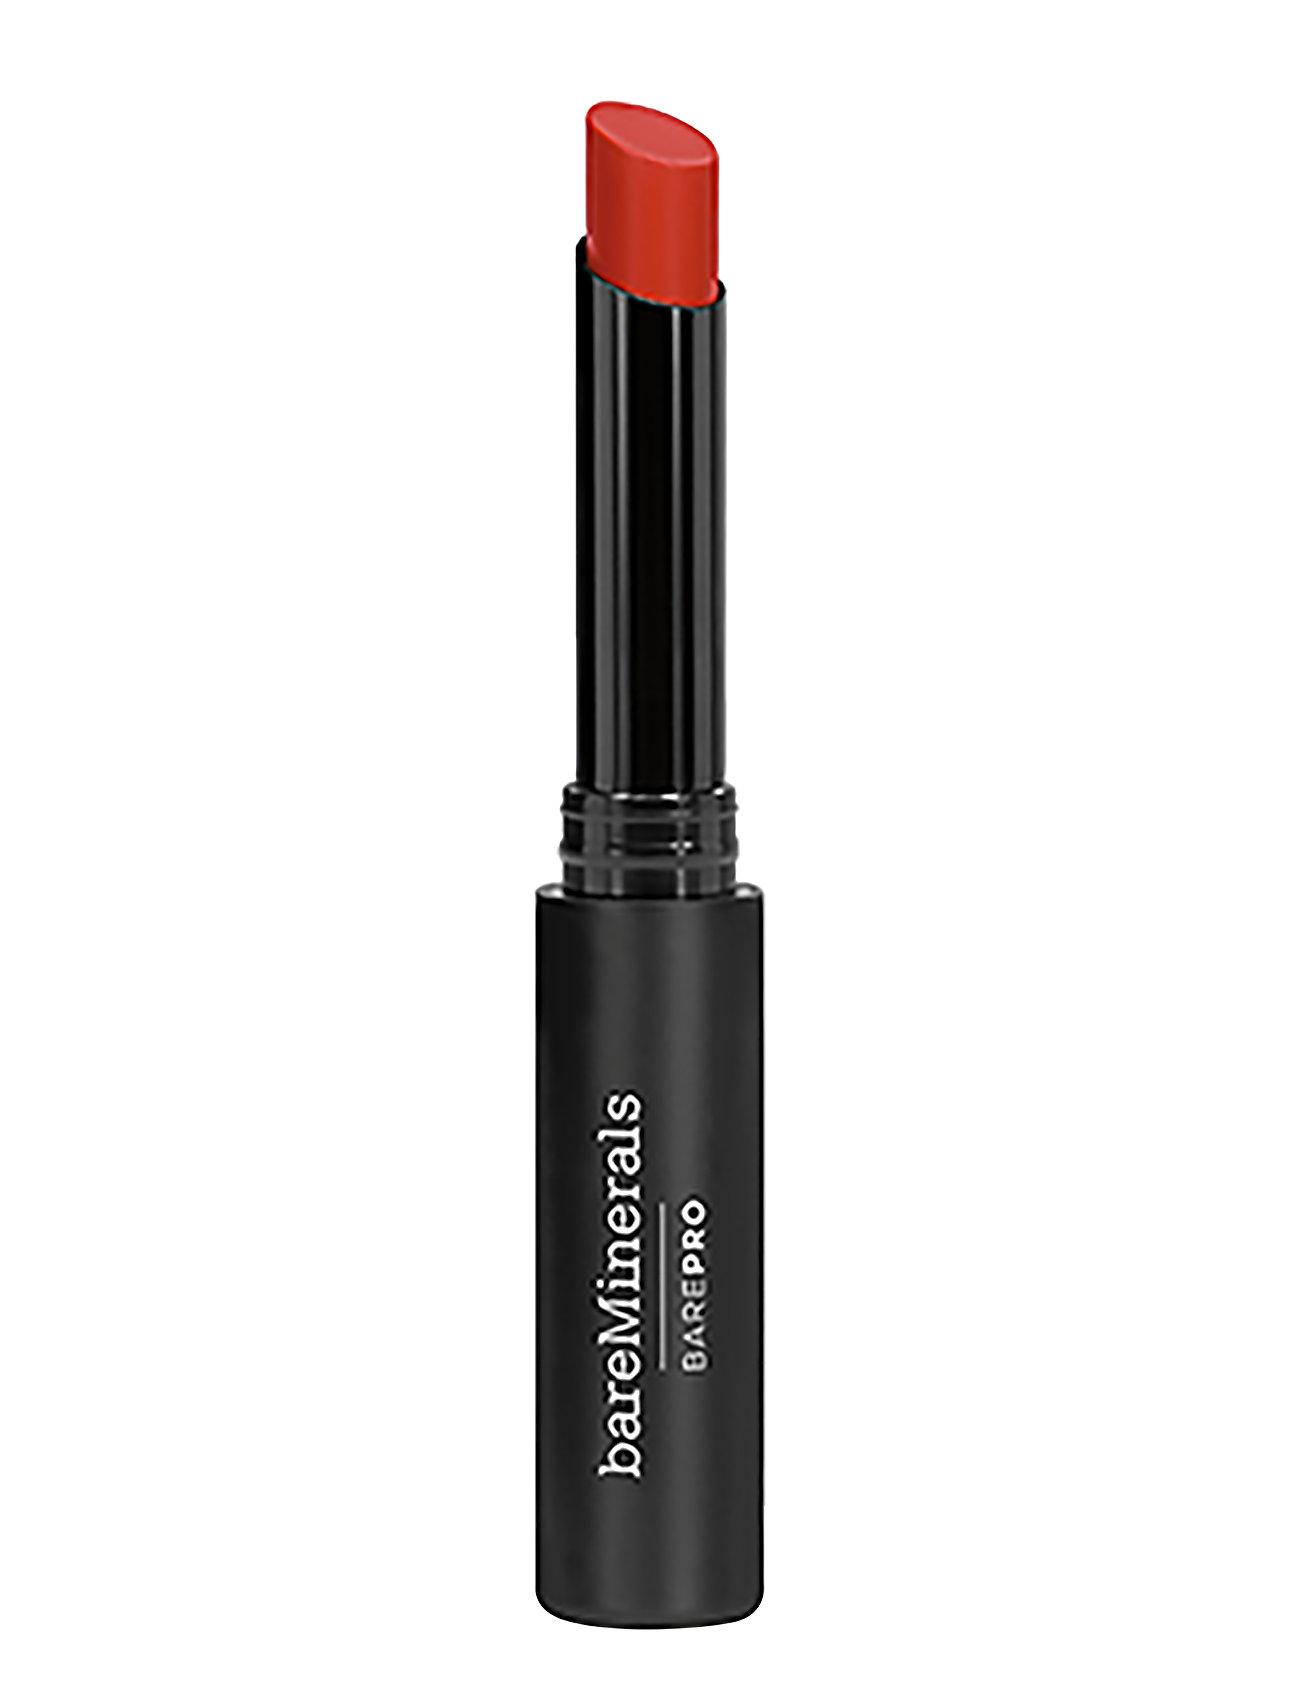 Image of Barepro Longwear Lipstick Saffron Læbestift Makeup Rød BareMinerals (3138616973)